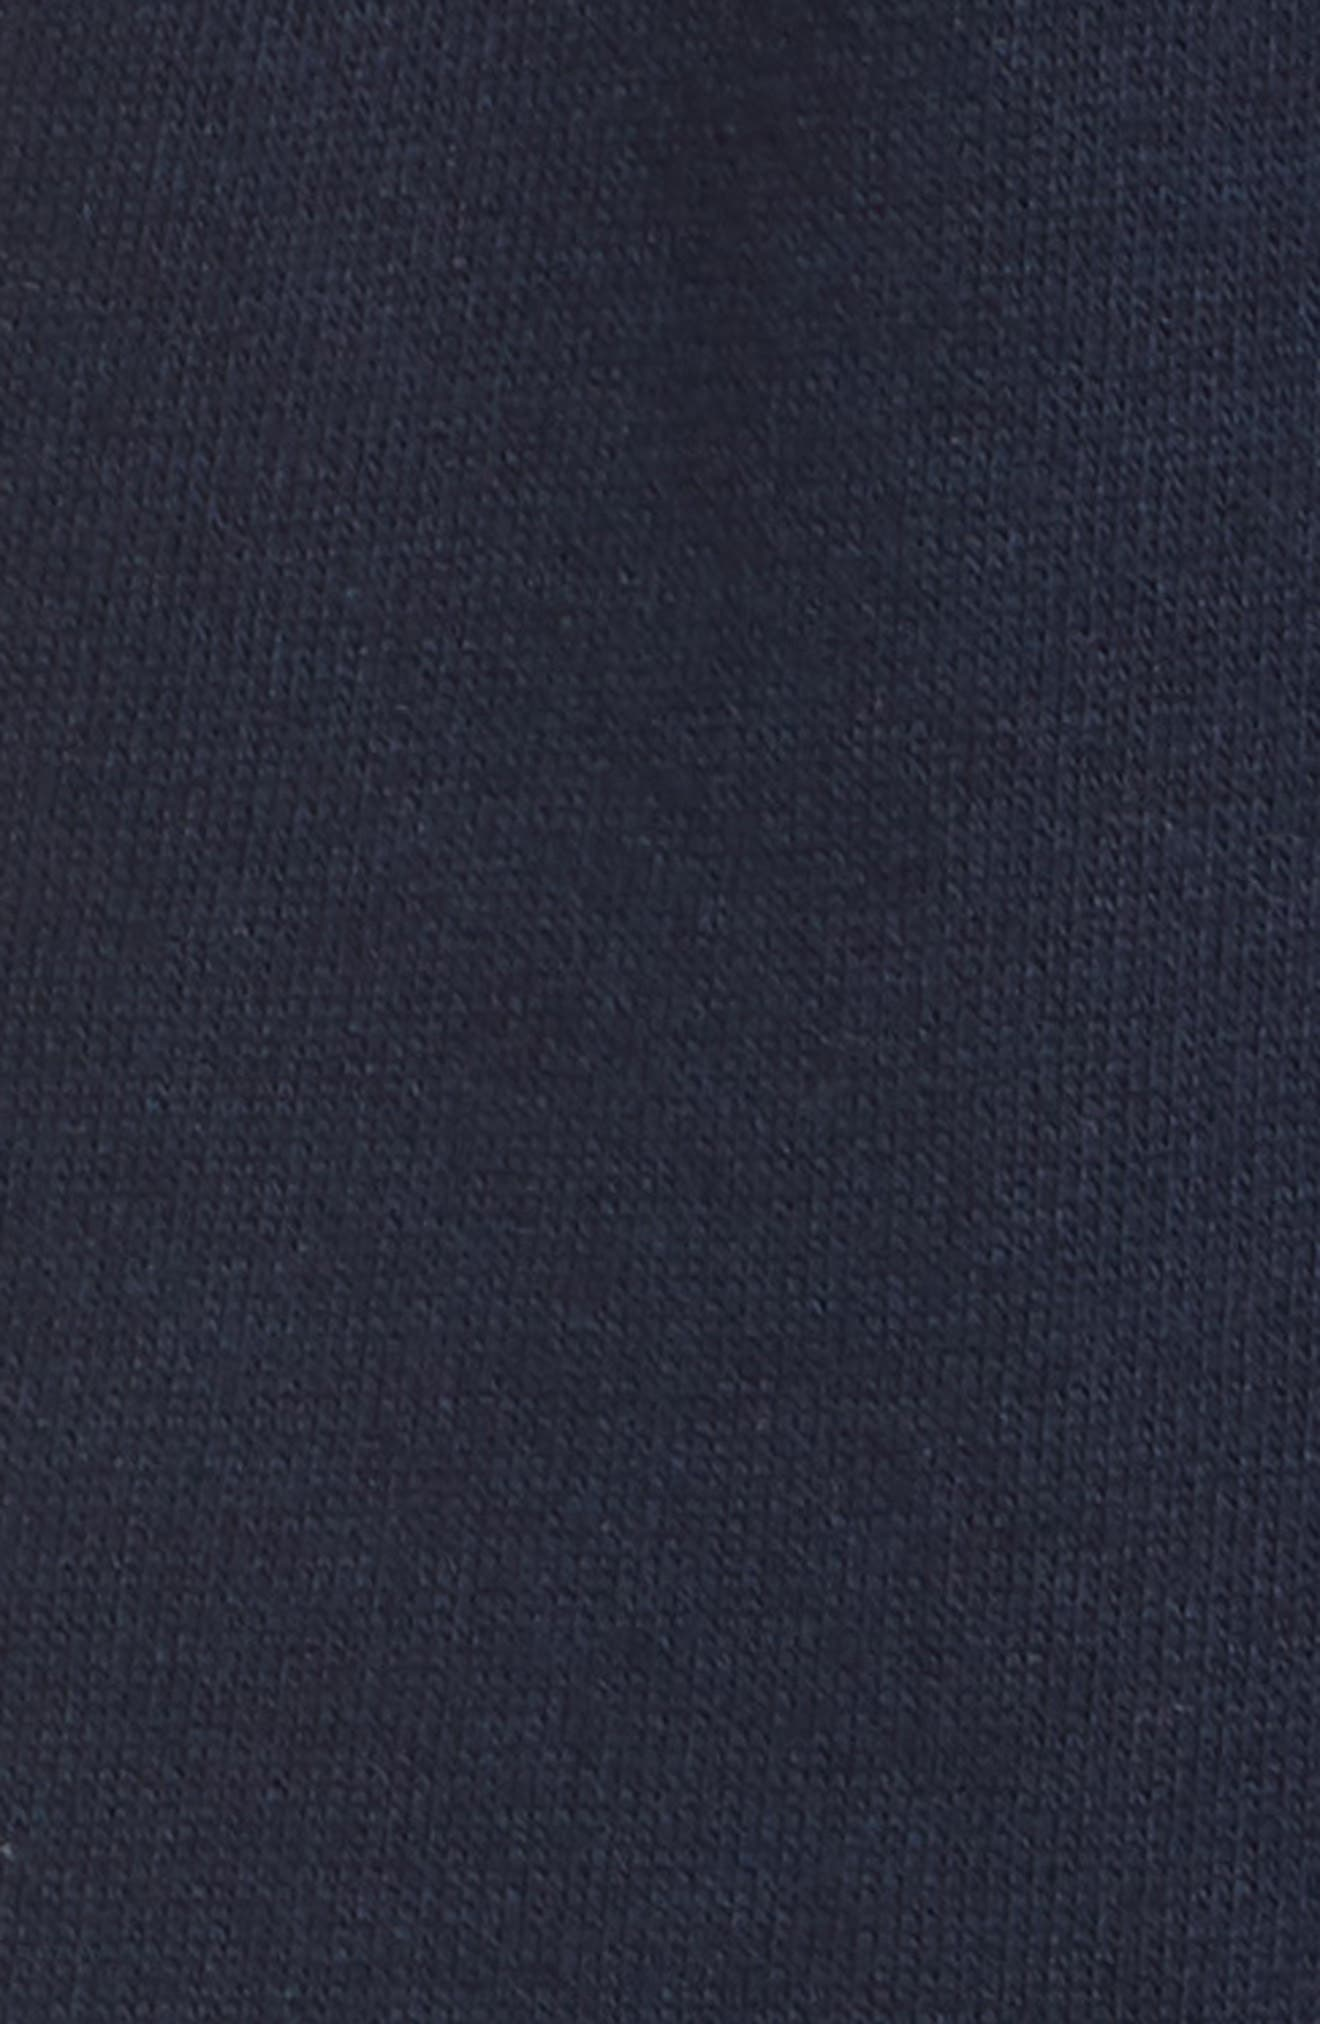 Lounge Shorts,                             Alternate thumbnail 9, color,